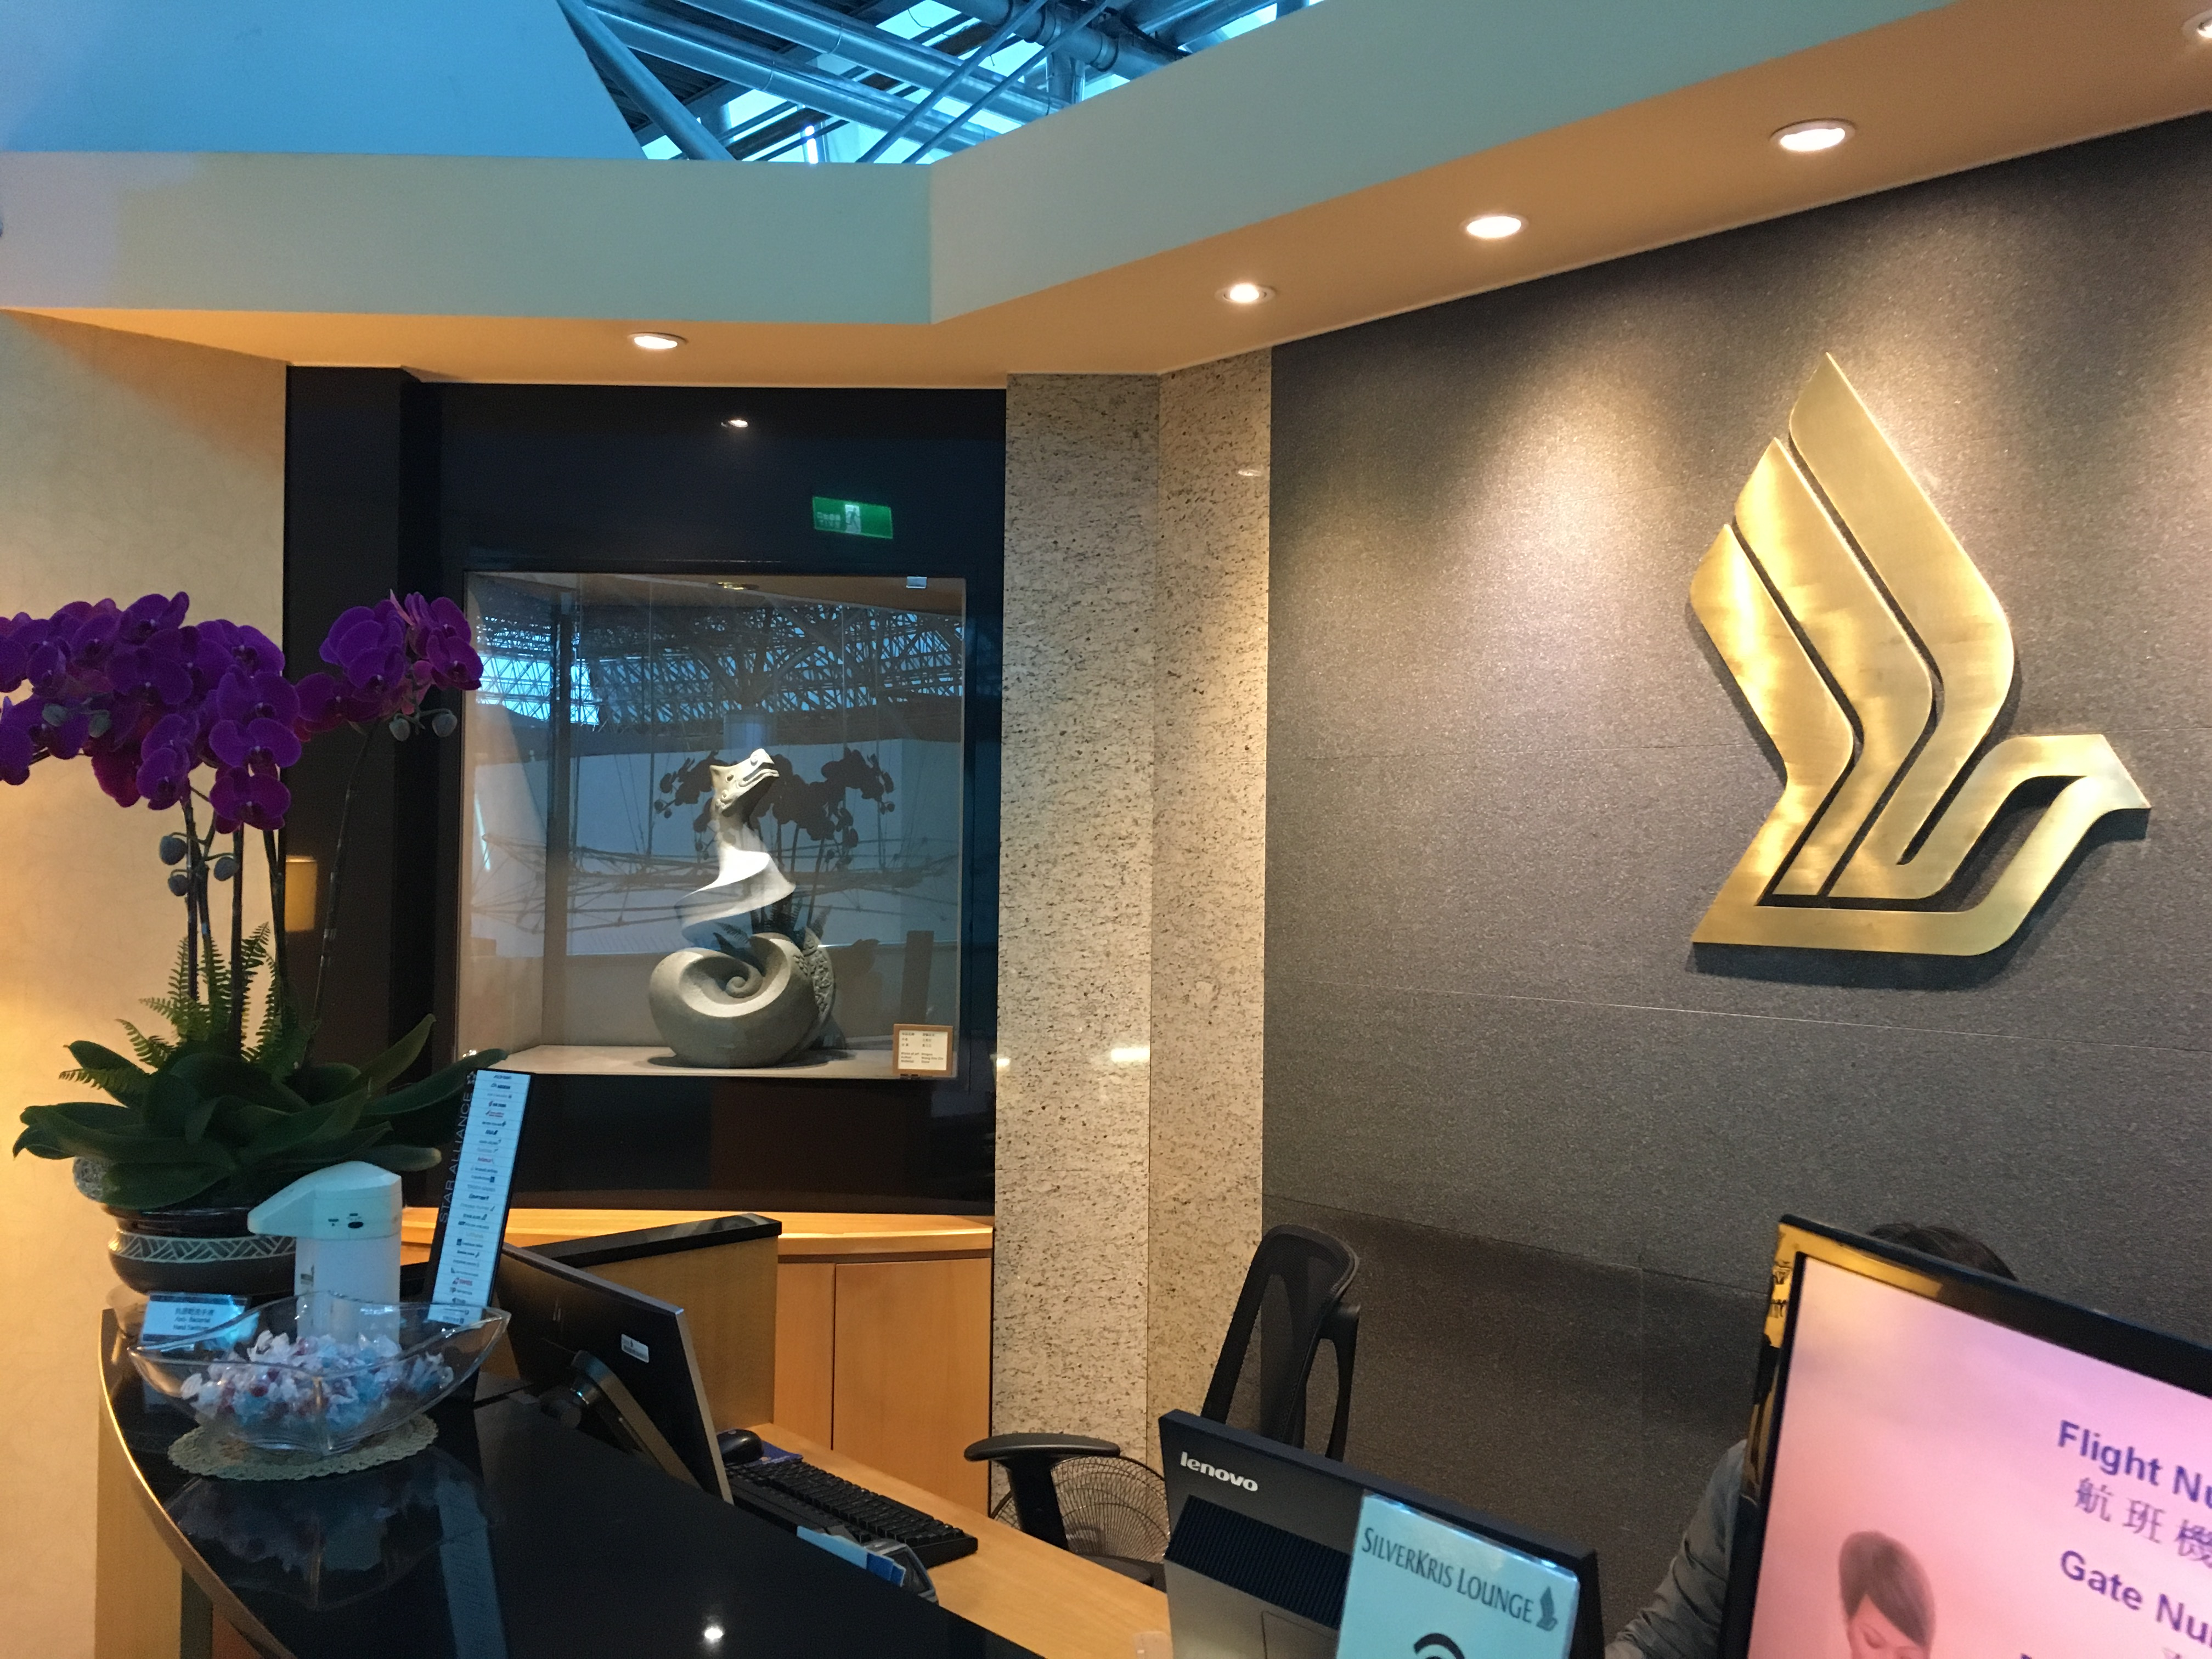 Lounge Review : 台北桃園空港(TPE)ターミナル2 シンガポール航空(SQ) シルバークリスラウンジ(SilverKris Lounge)